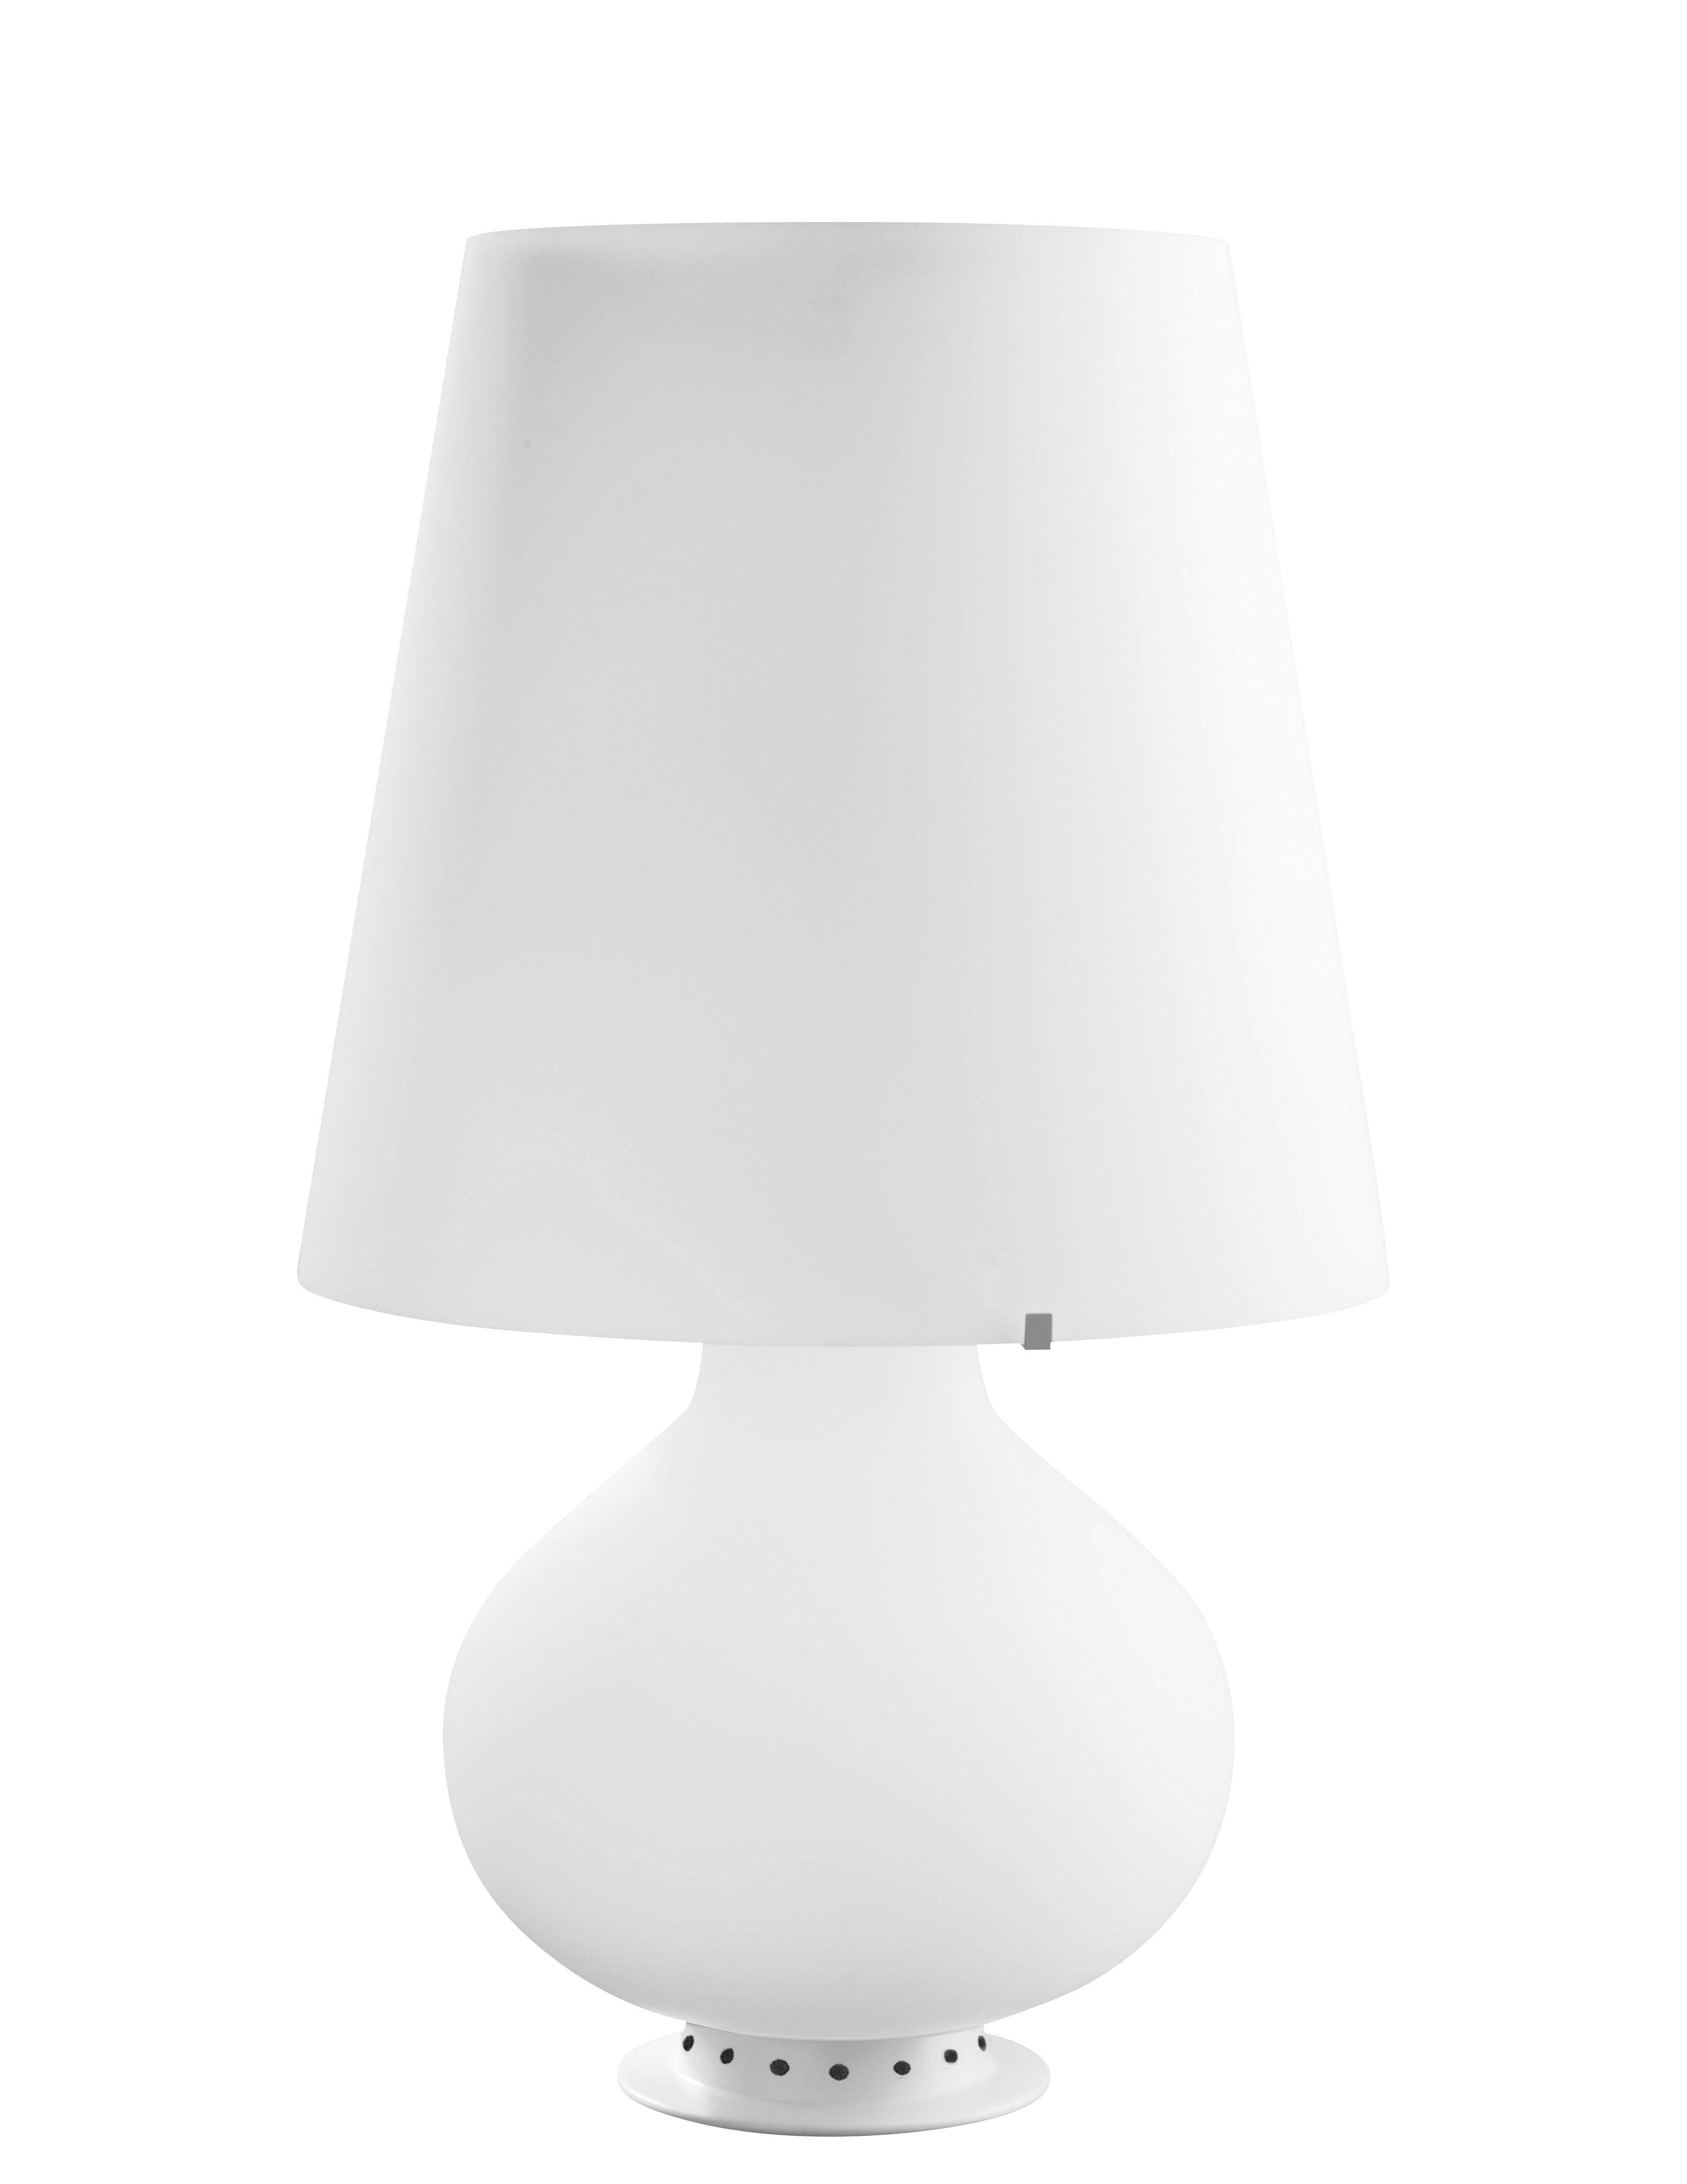 Lighting - Table Lamps - Fontana Medium Table lamp - / LED - H 53 cm by Fontana Arte - H 53 / White - Blown glass, Metal